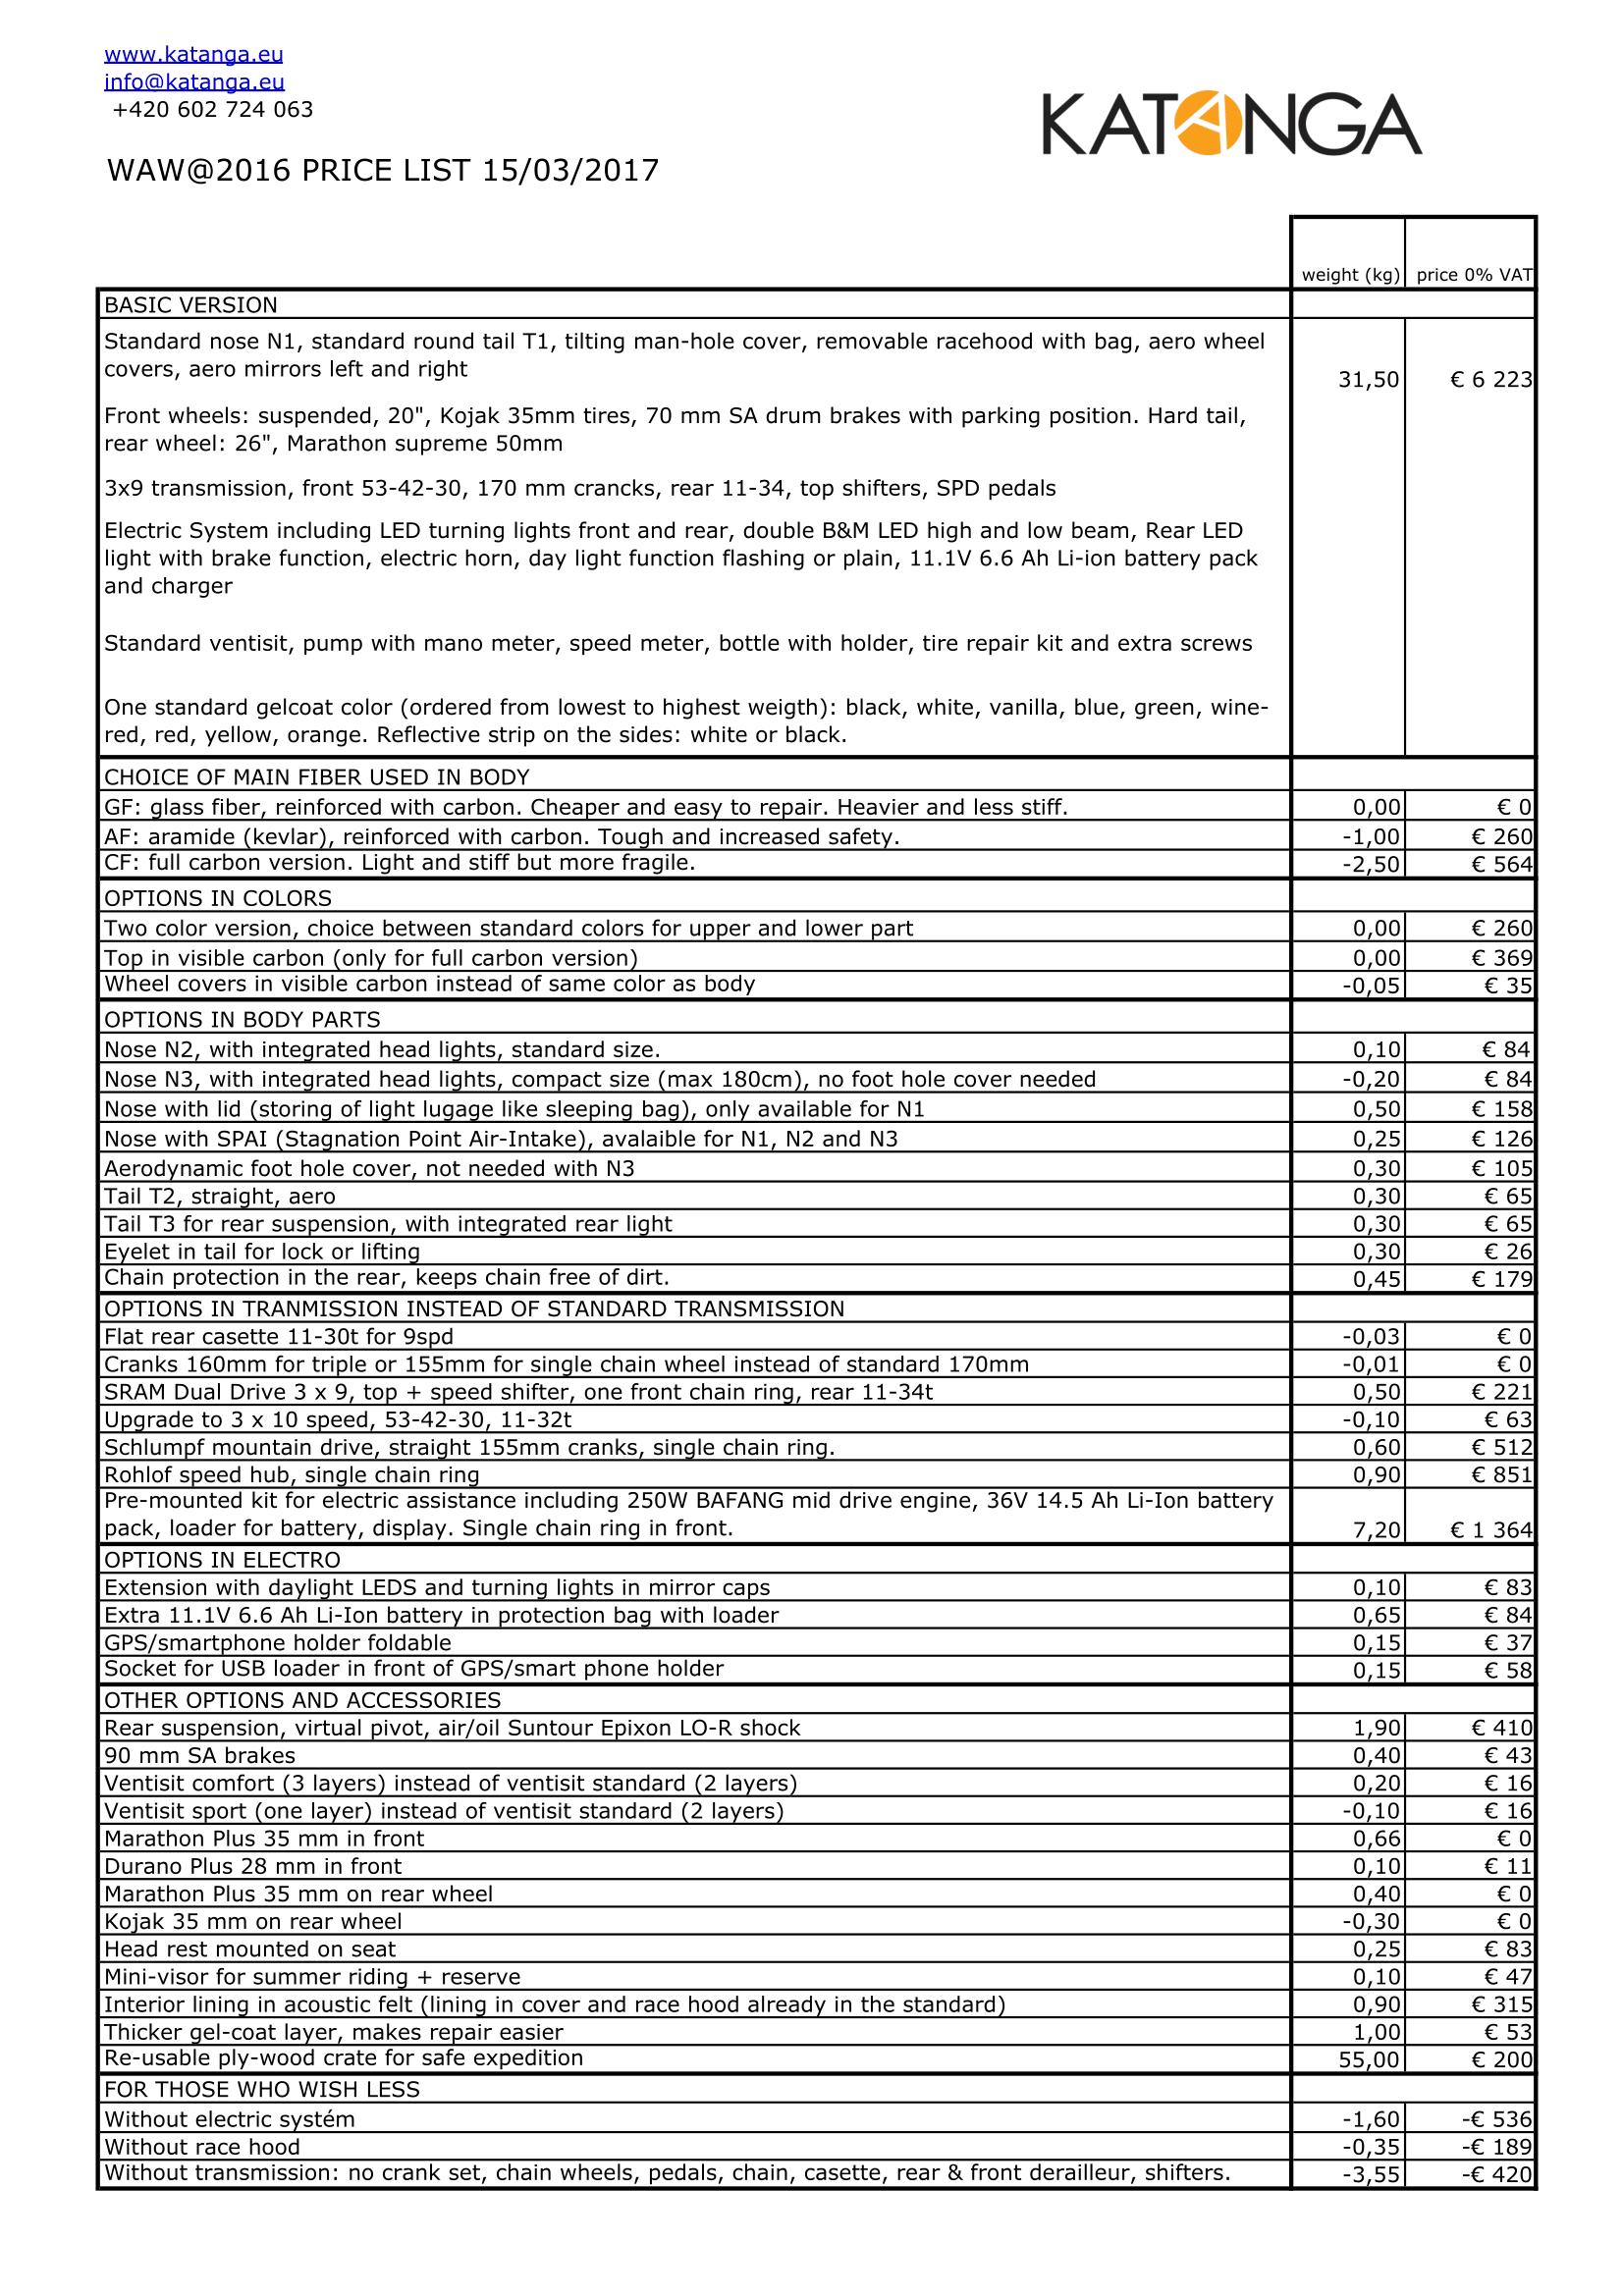 pdf standart webpages (1)-page-001